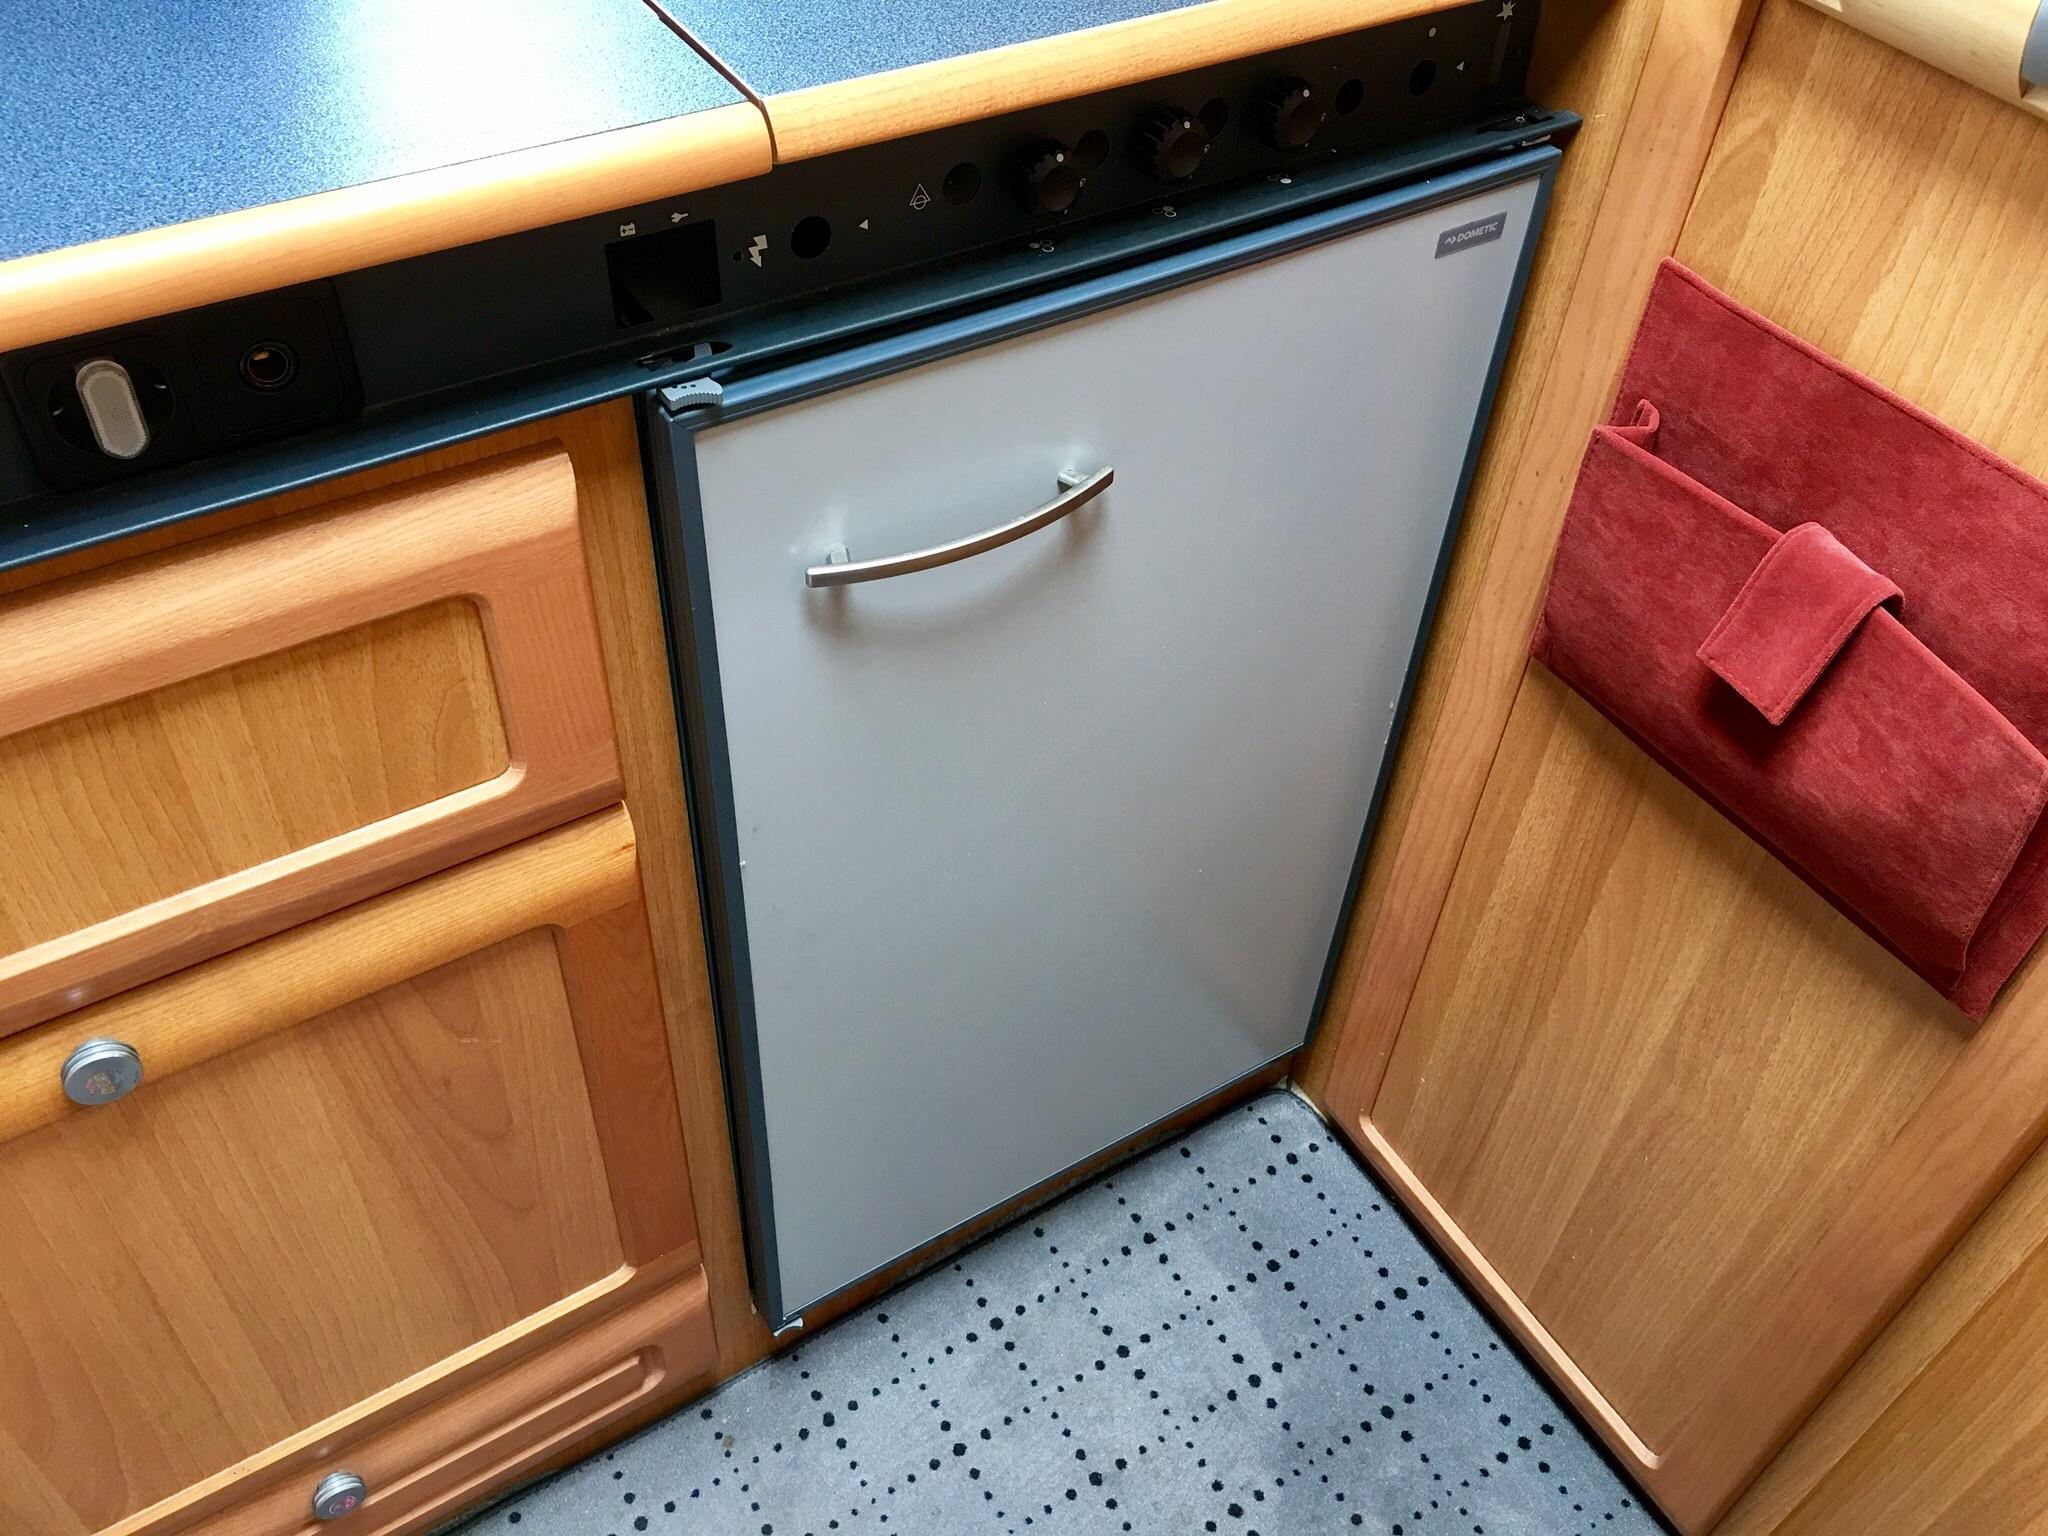 Electrolux Kühlschrank Wohnmobil : Kühlschrank kompressor statt absorber u erste eindrücke u werners